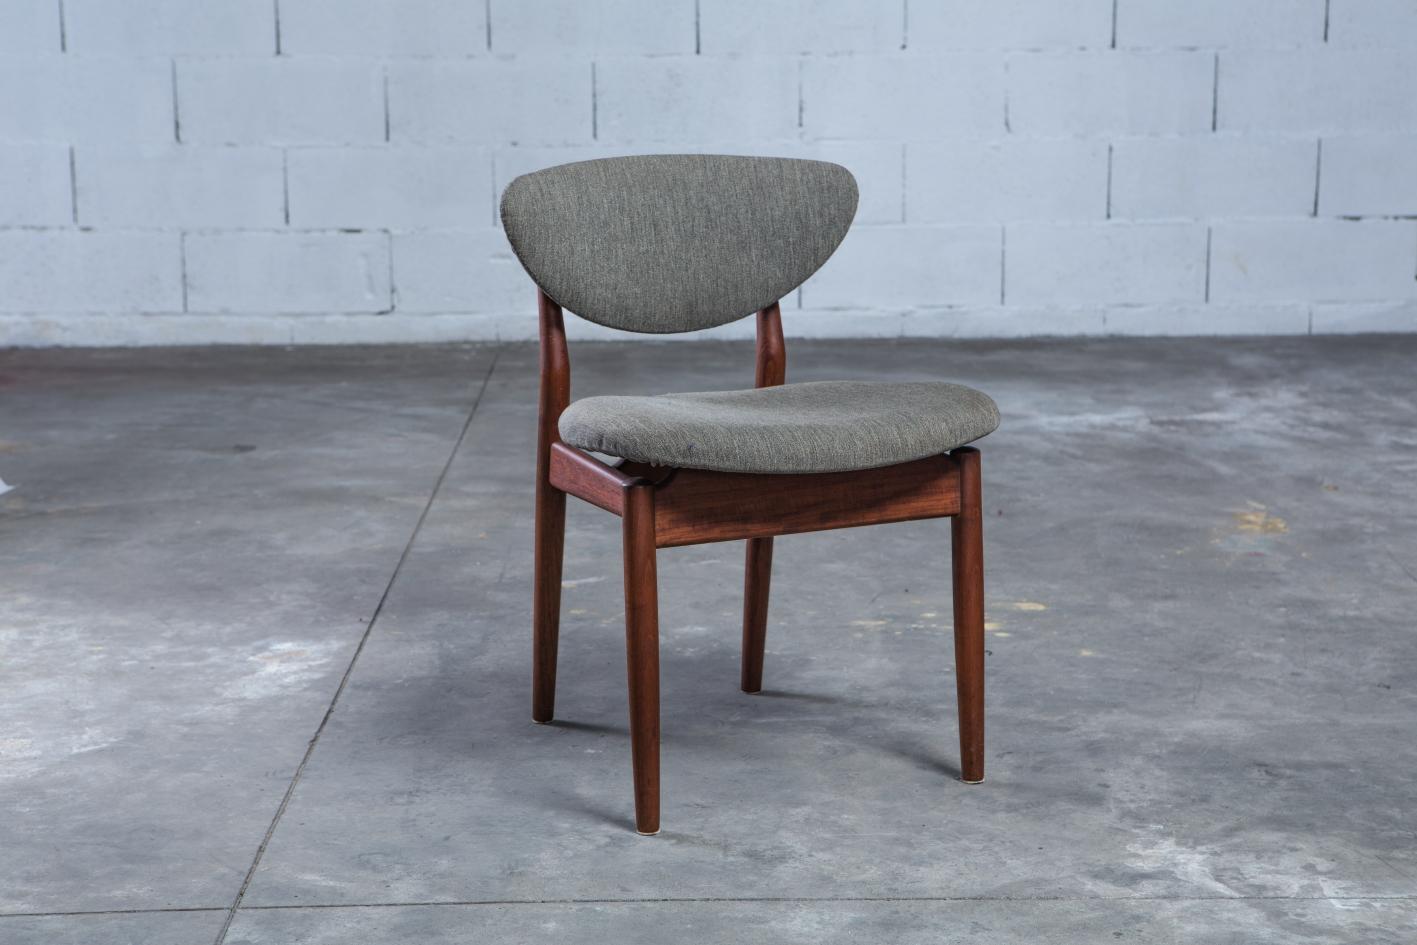 NV108 - Fj55 chairs - Finn Juhl for Niels Vodder - 3/4 front view